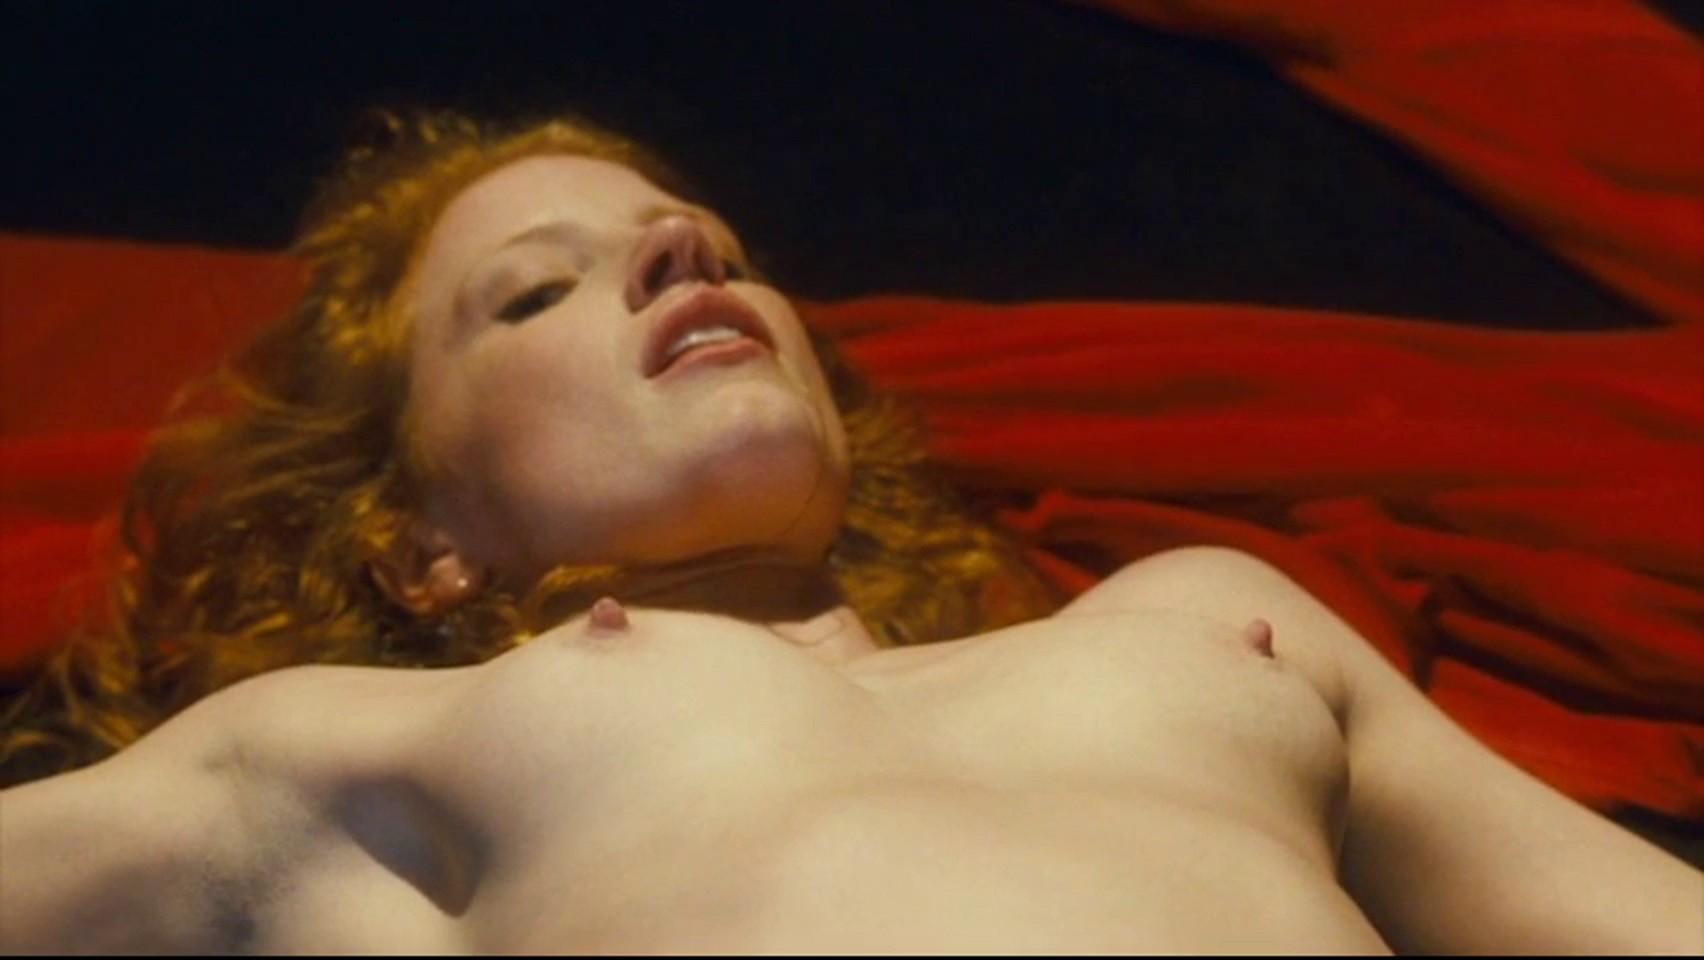 Pelicula porno de susan sharandon Fotos De Susan Sarandon Desnuda